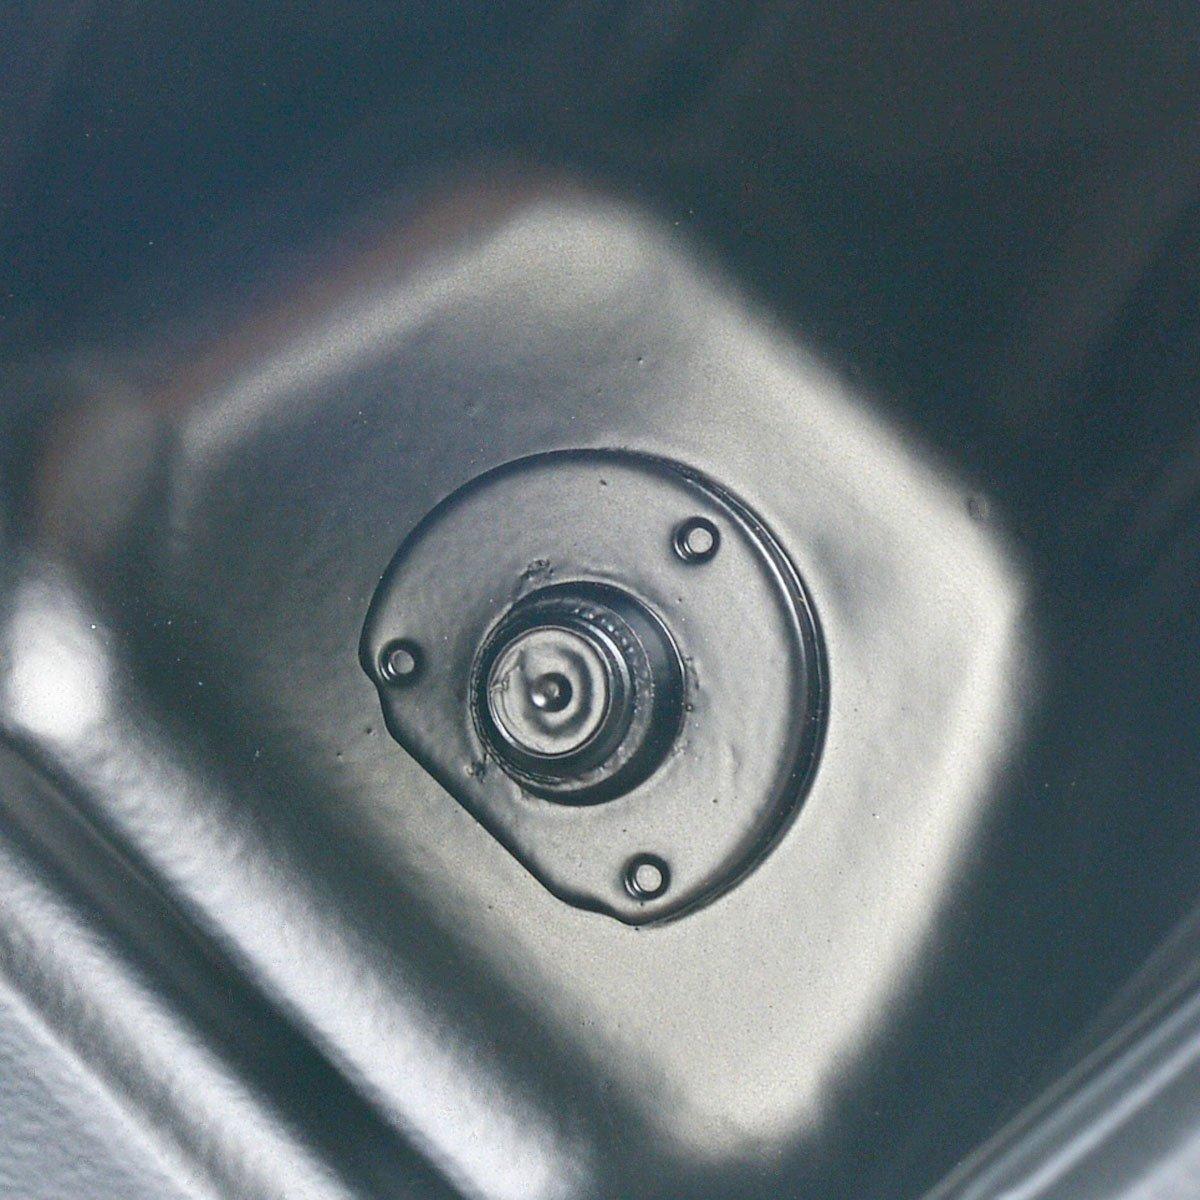 A-Premium Lower Engine Oil Pan for Toyota Land Cruiser Sequoia 2008-2014 Tundra 2007-2014 Lexus LX570 5.7L